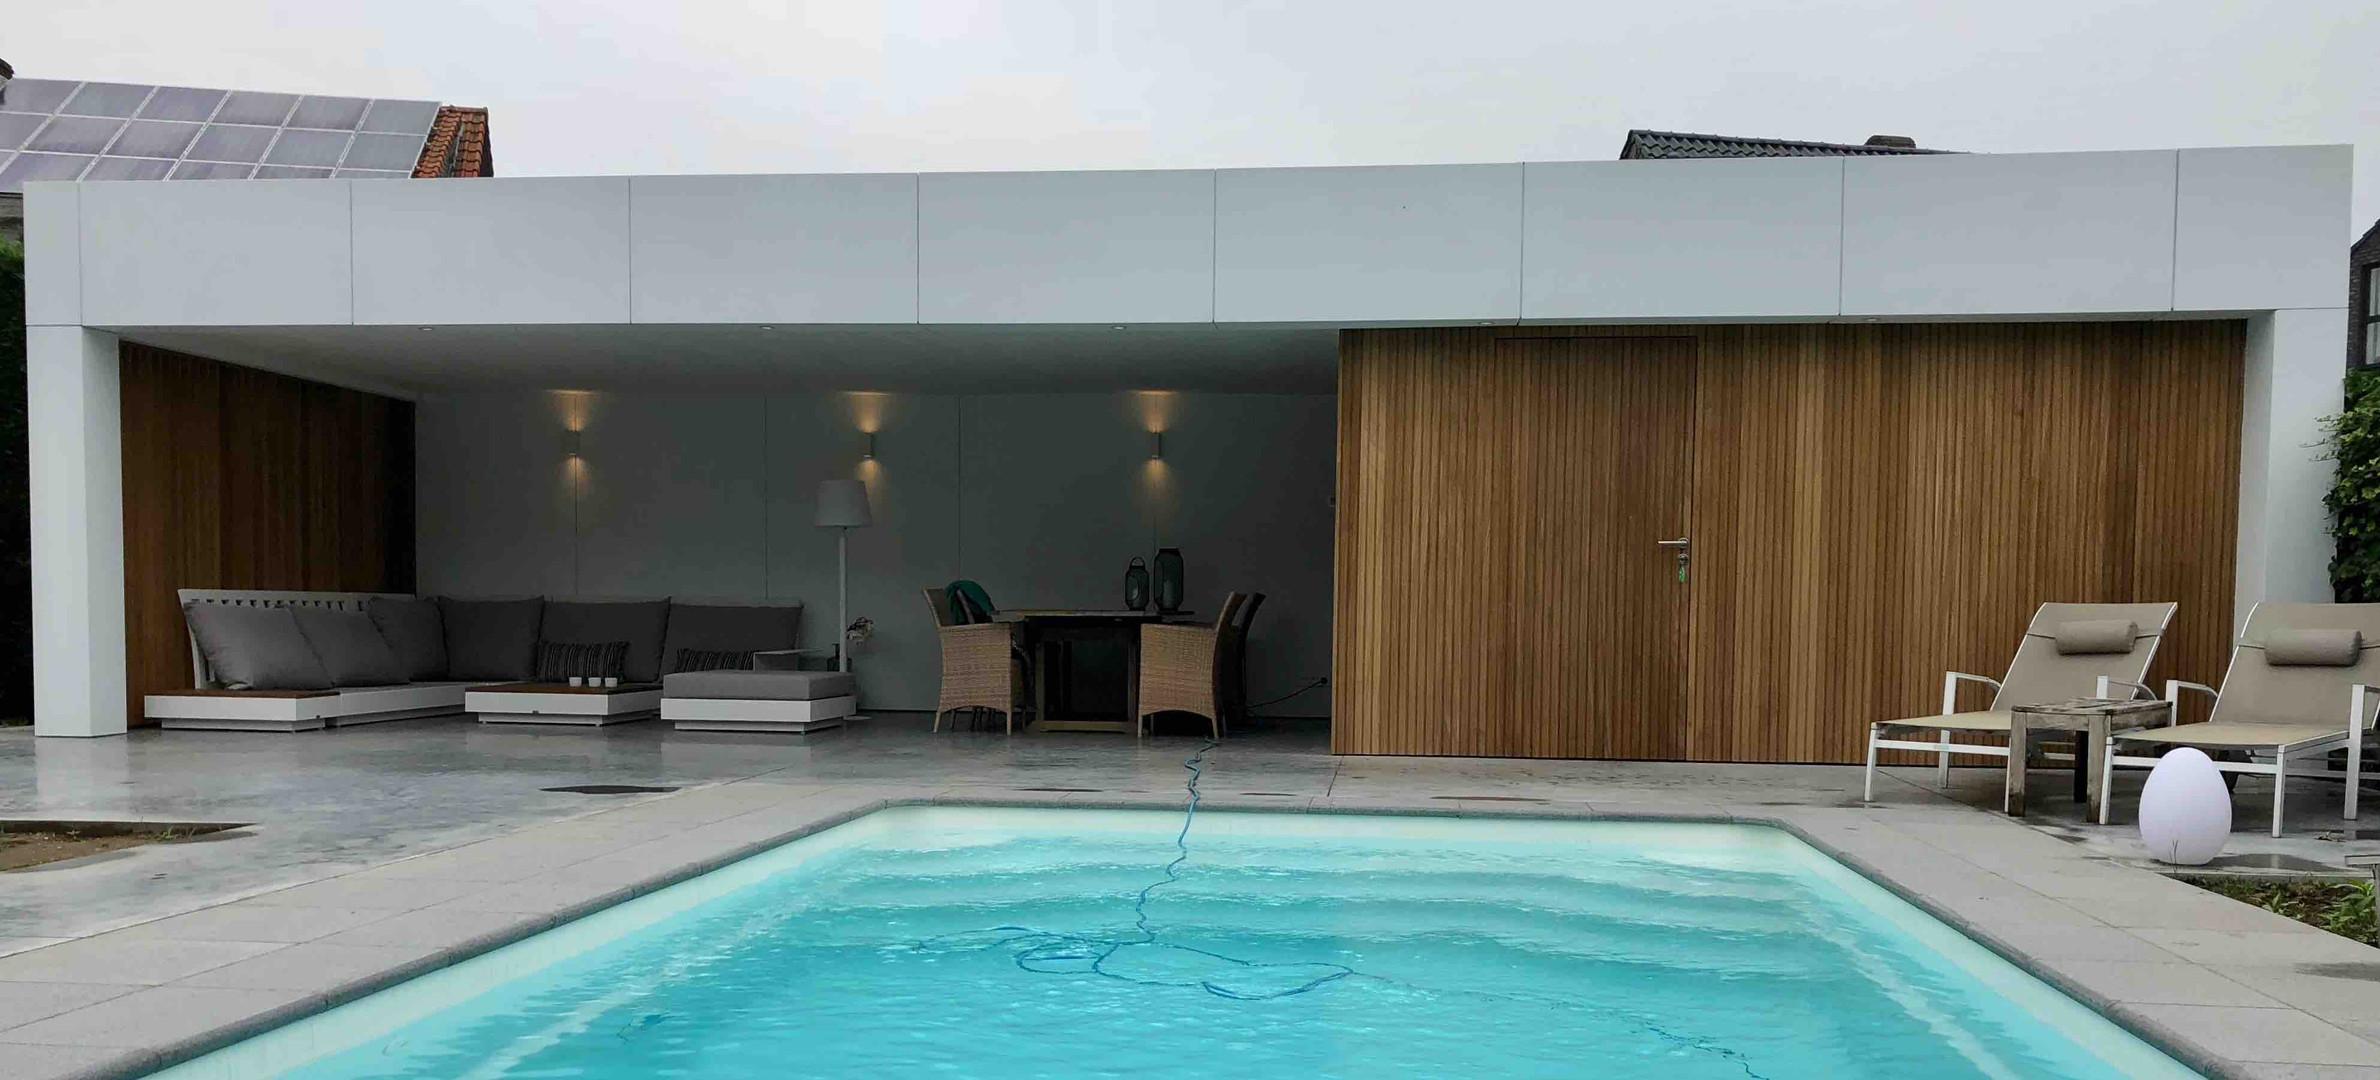 poolhouse wit aluminium .jpg